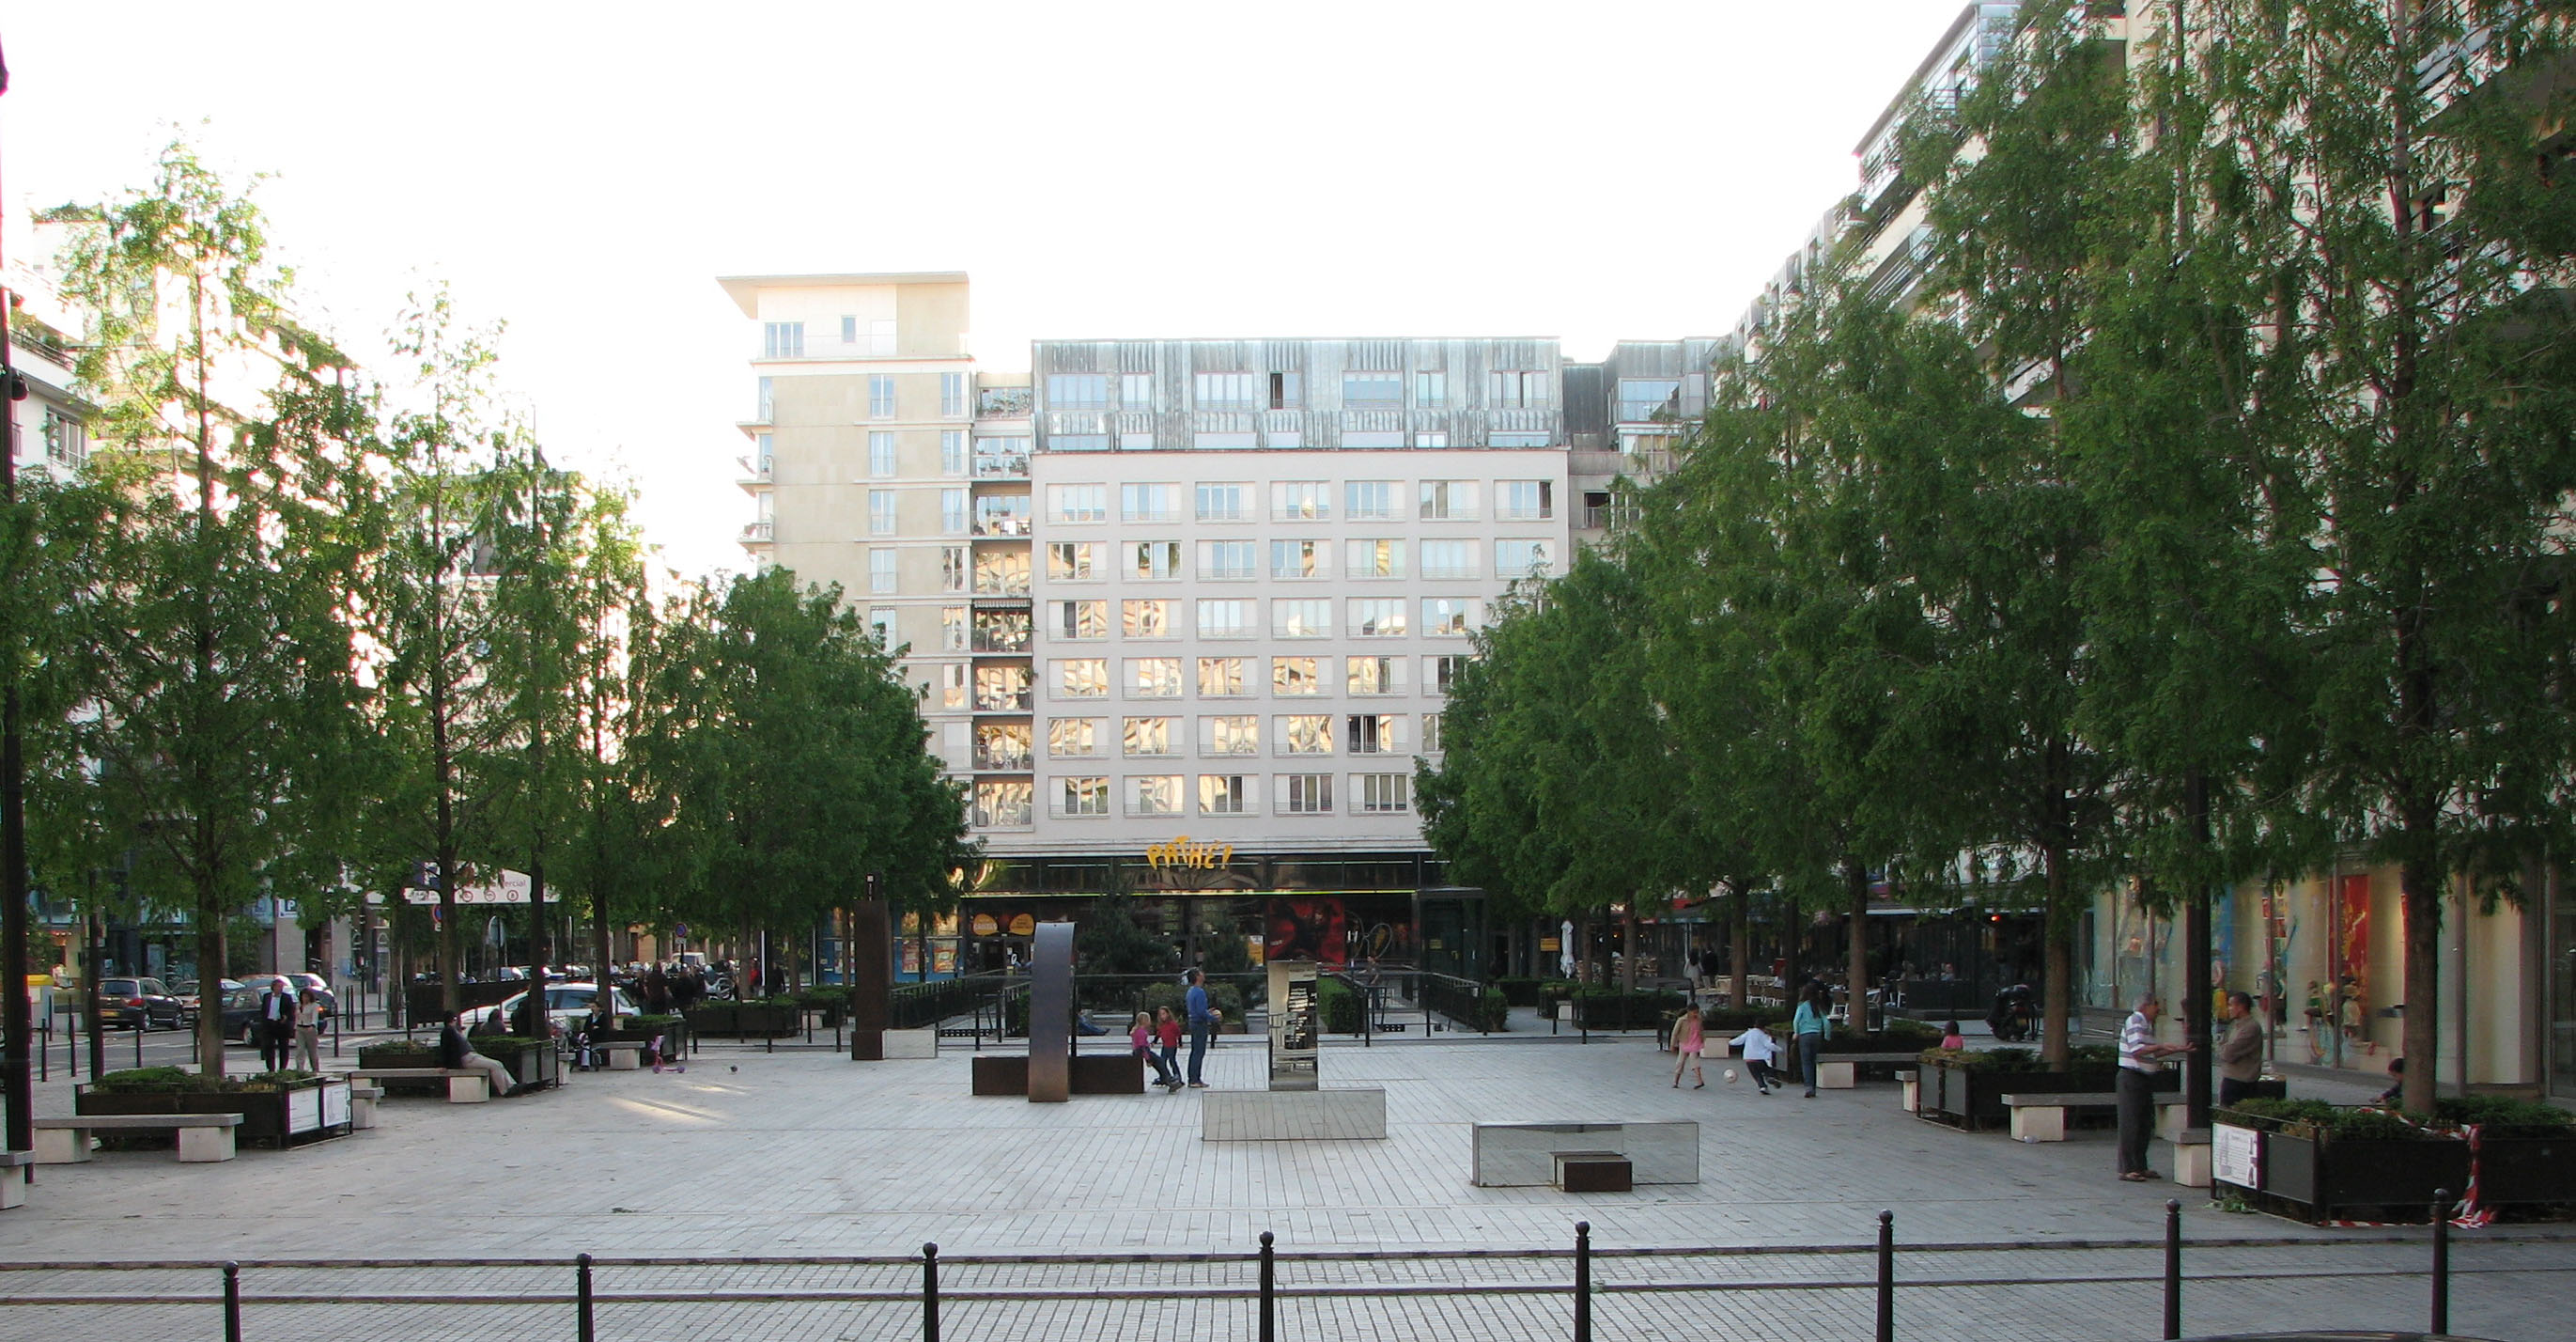 Centre ville boulogne billancourt for Boulogne billancourt piscine